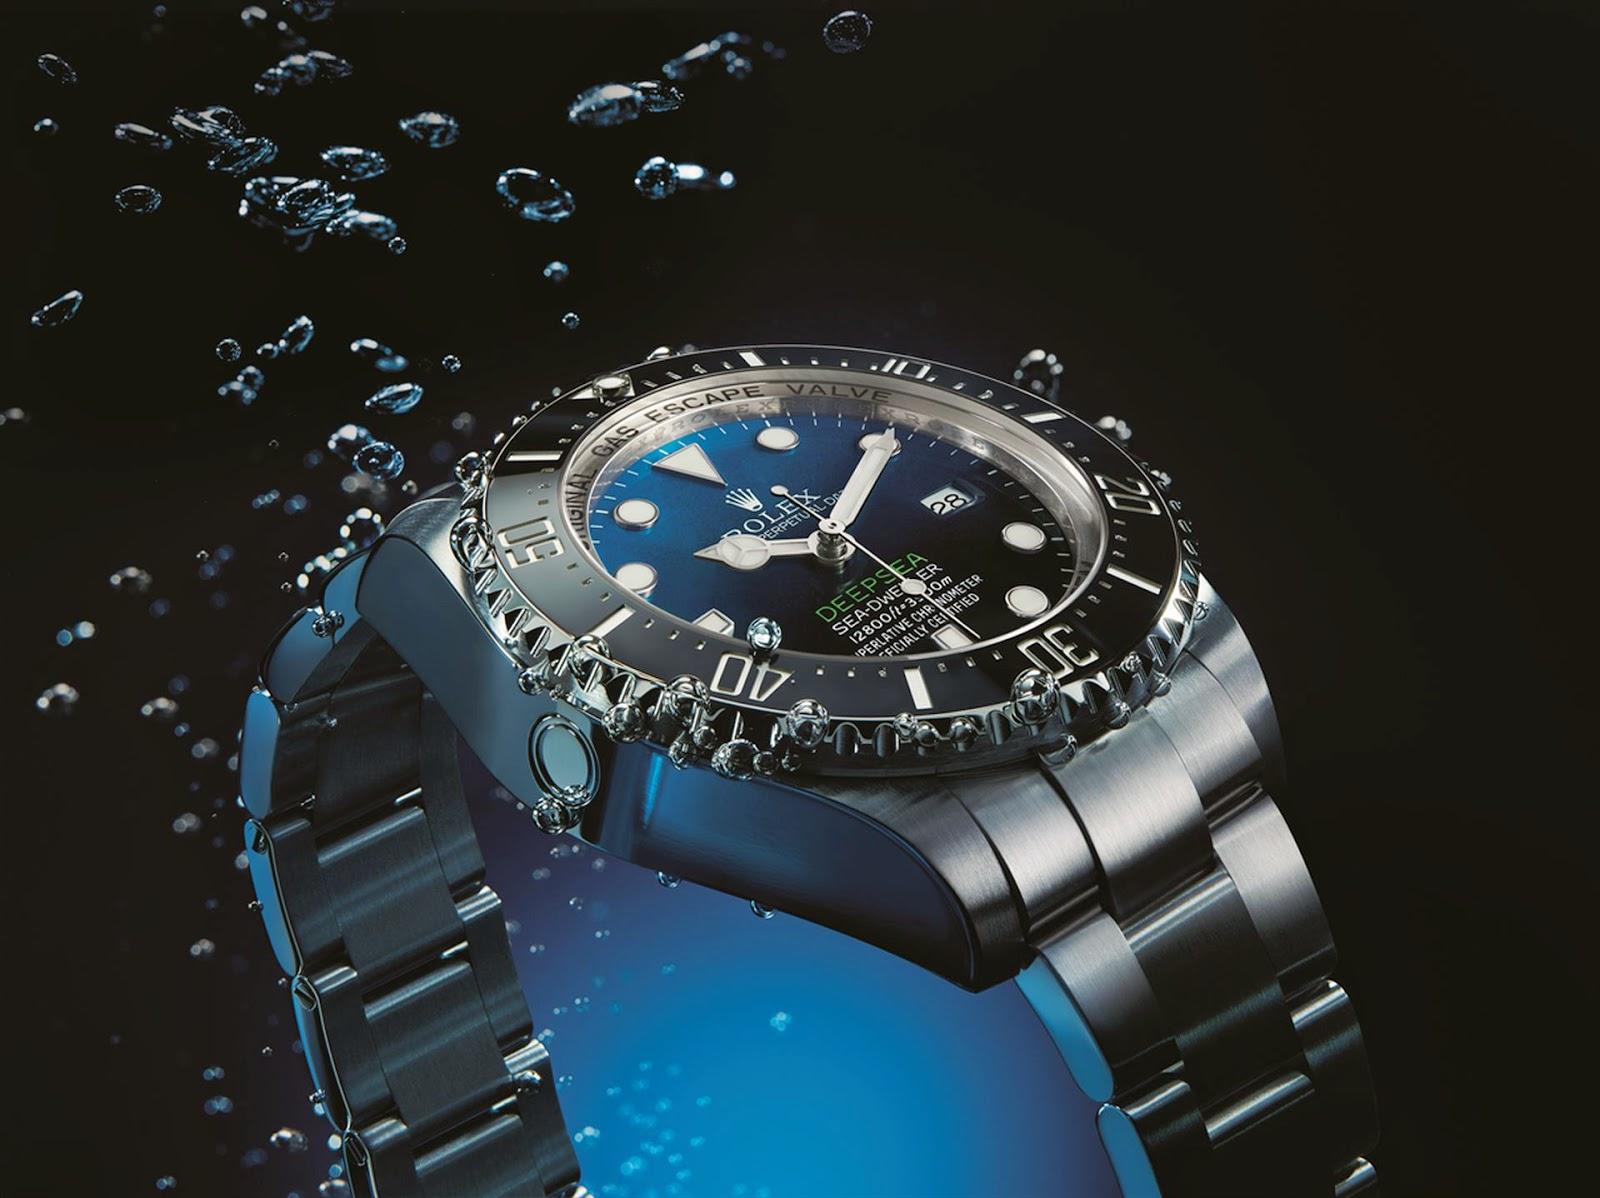 Rolex submersible Deepsea watch replica